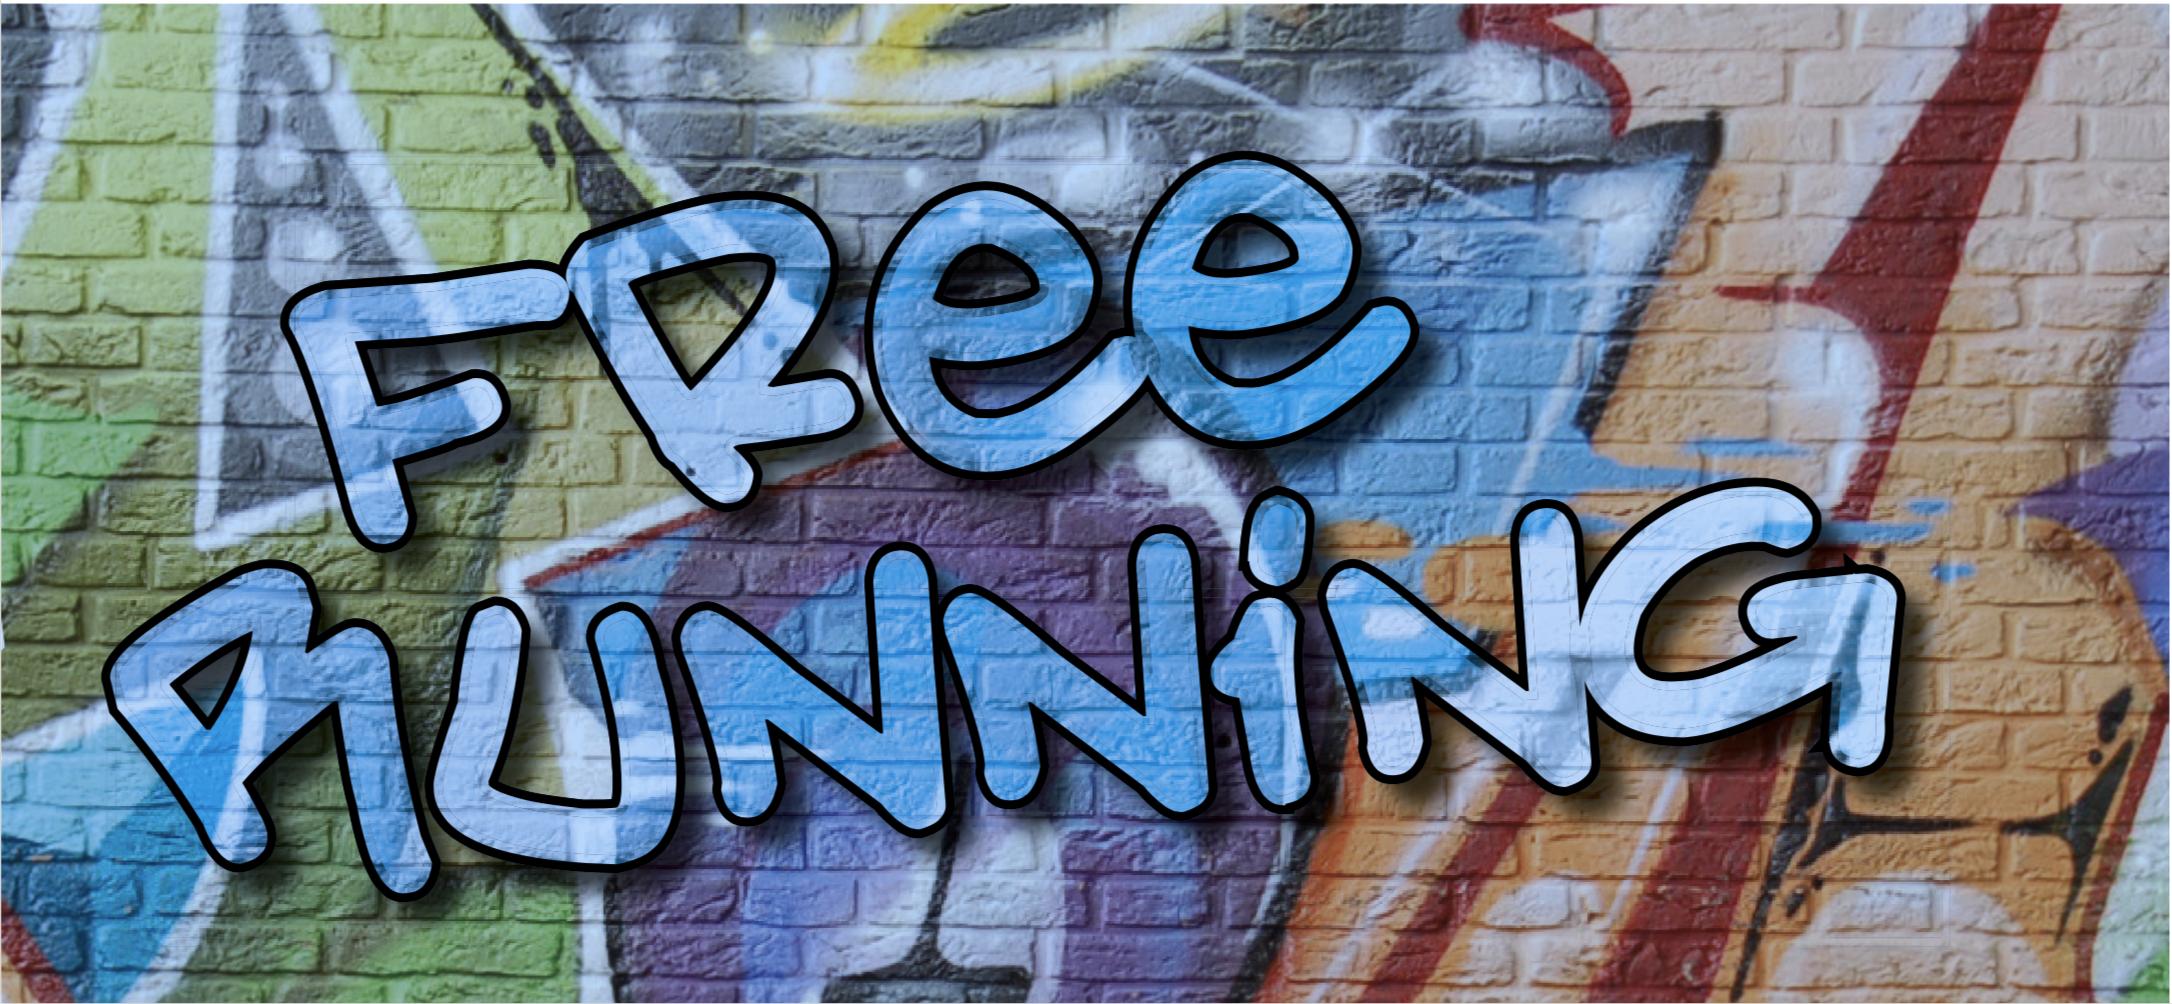 Freerunning - Sportvereniging Serooskerke